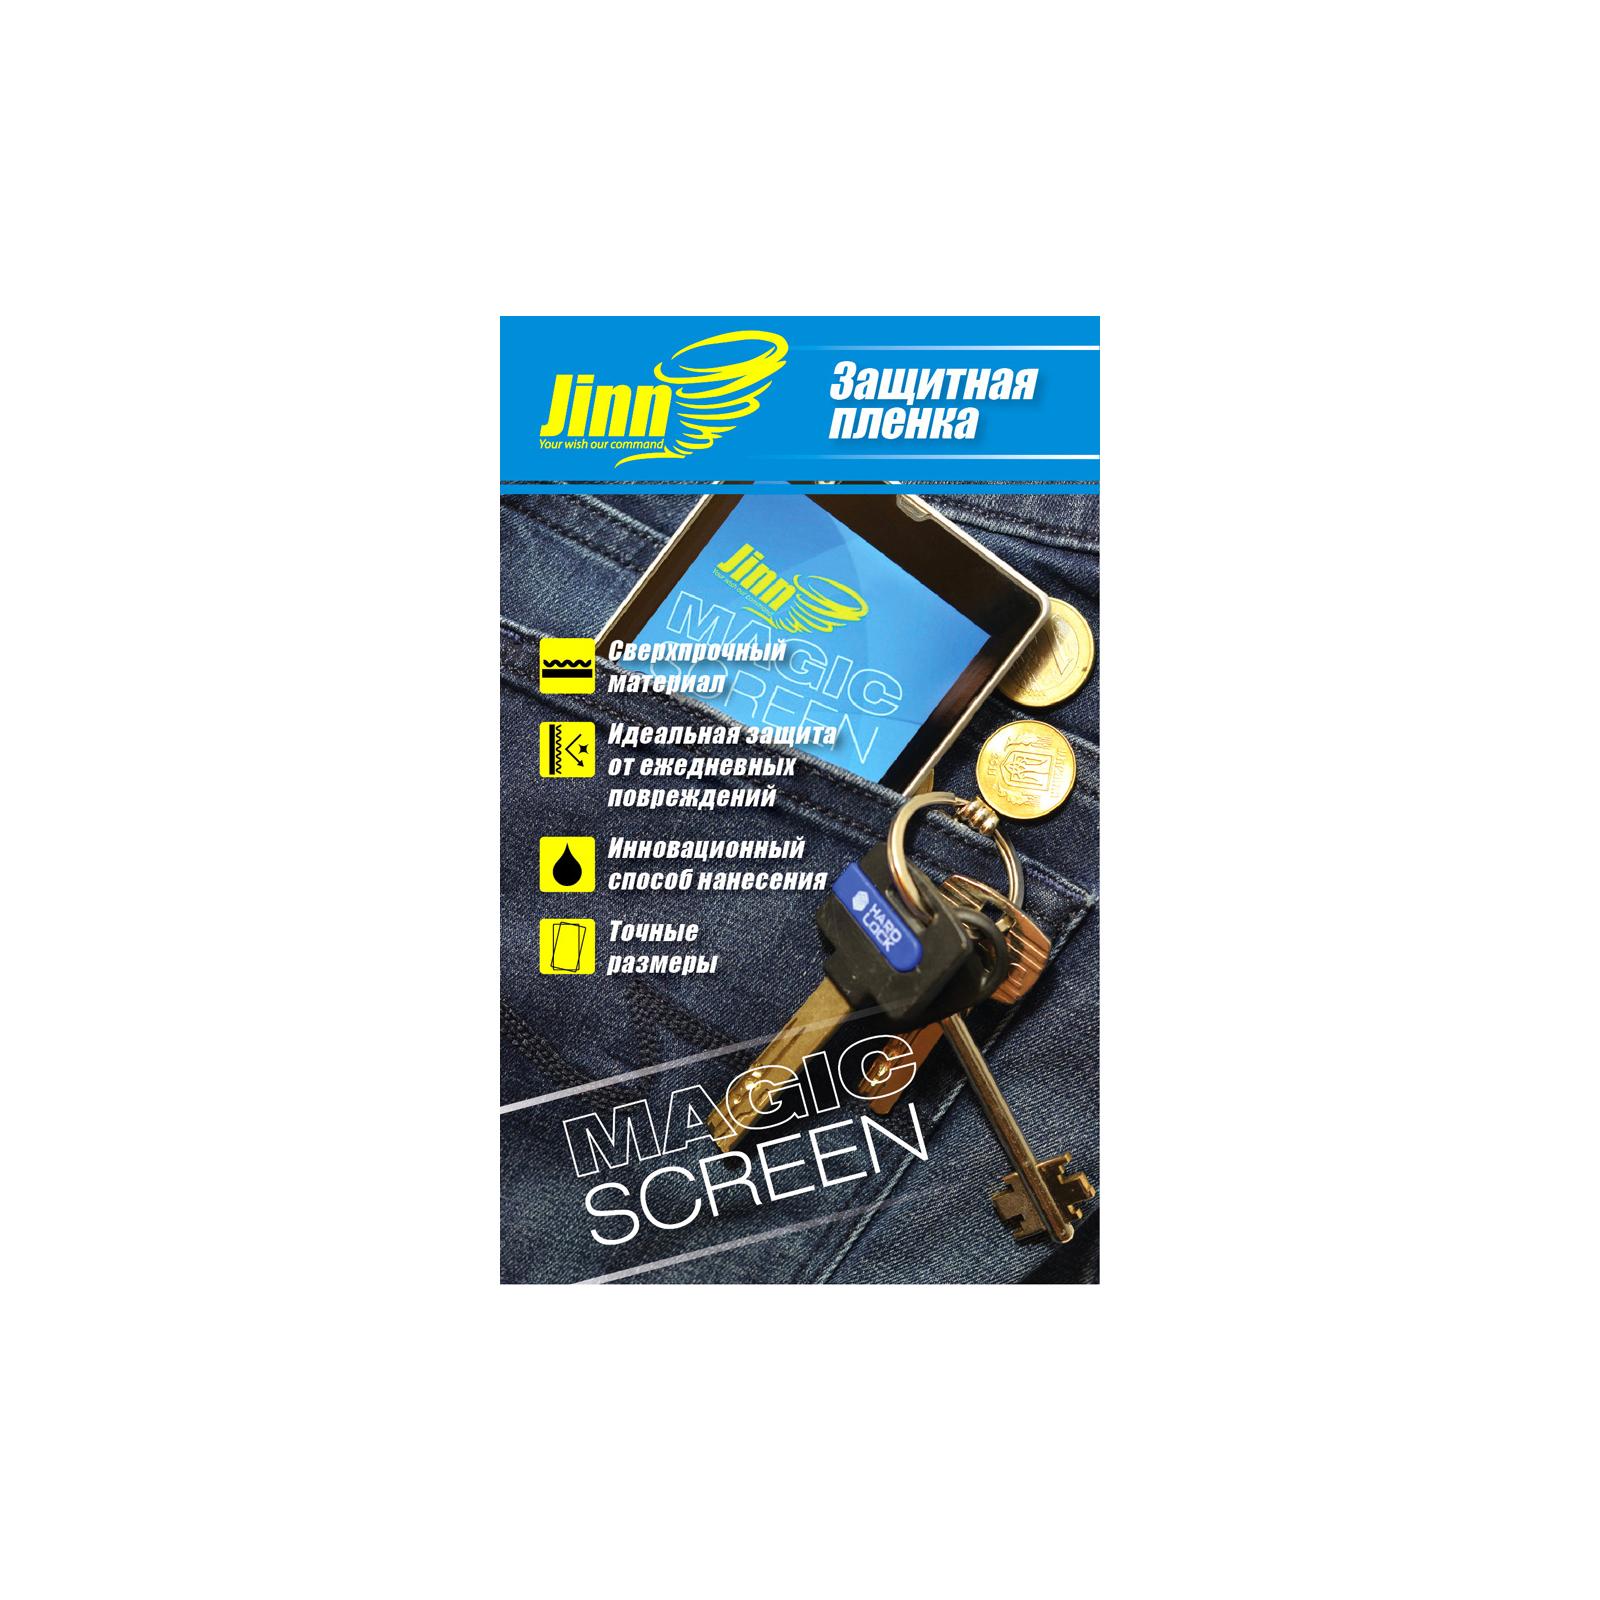 Пленка защитная JINN ультрапрочная Magic Screen для HUAWEI AscendG510 U8951 (HUAWEI AscendG510 front)